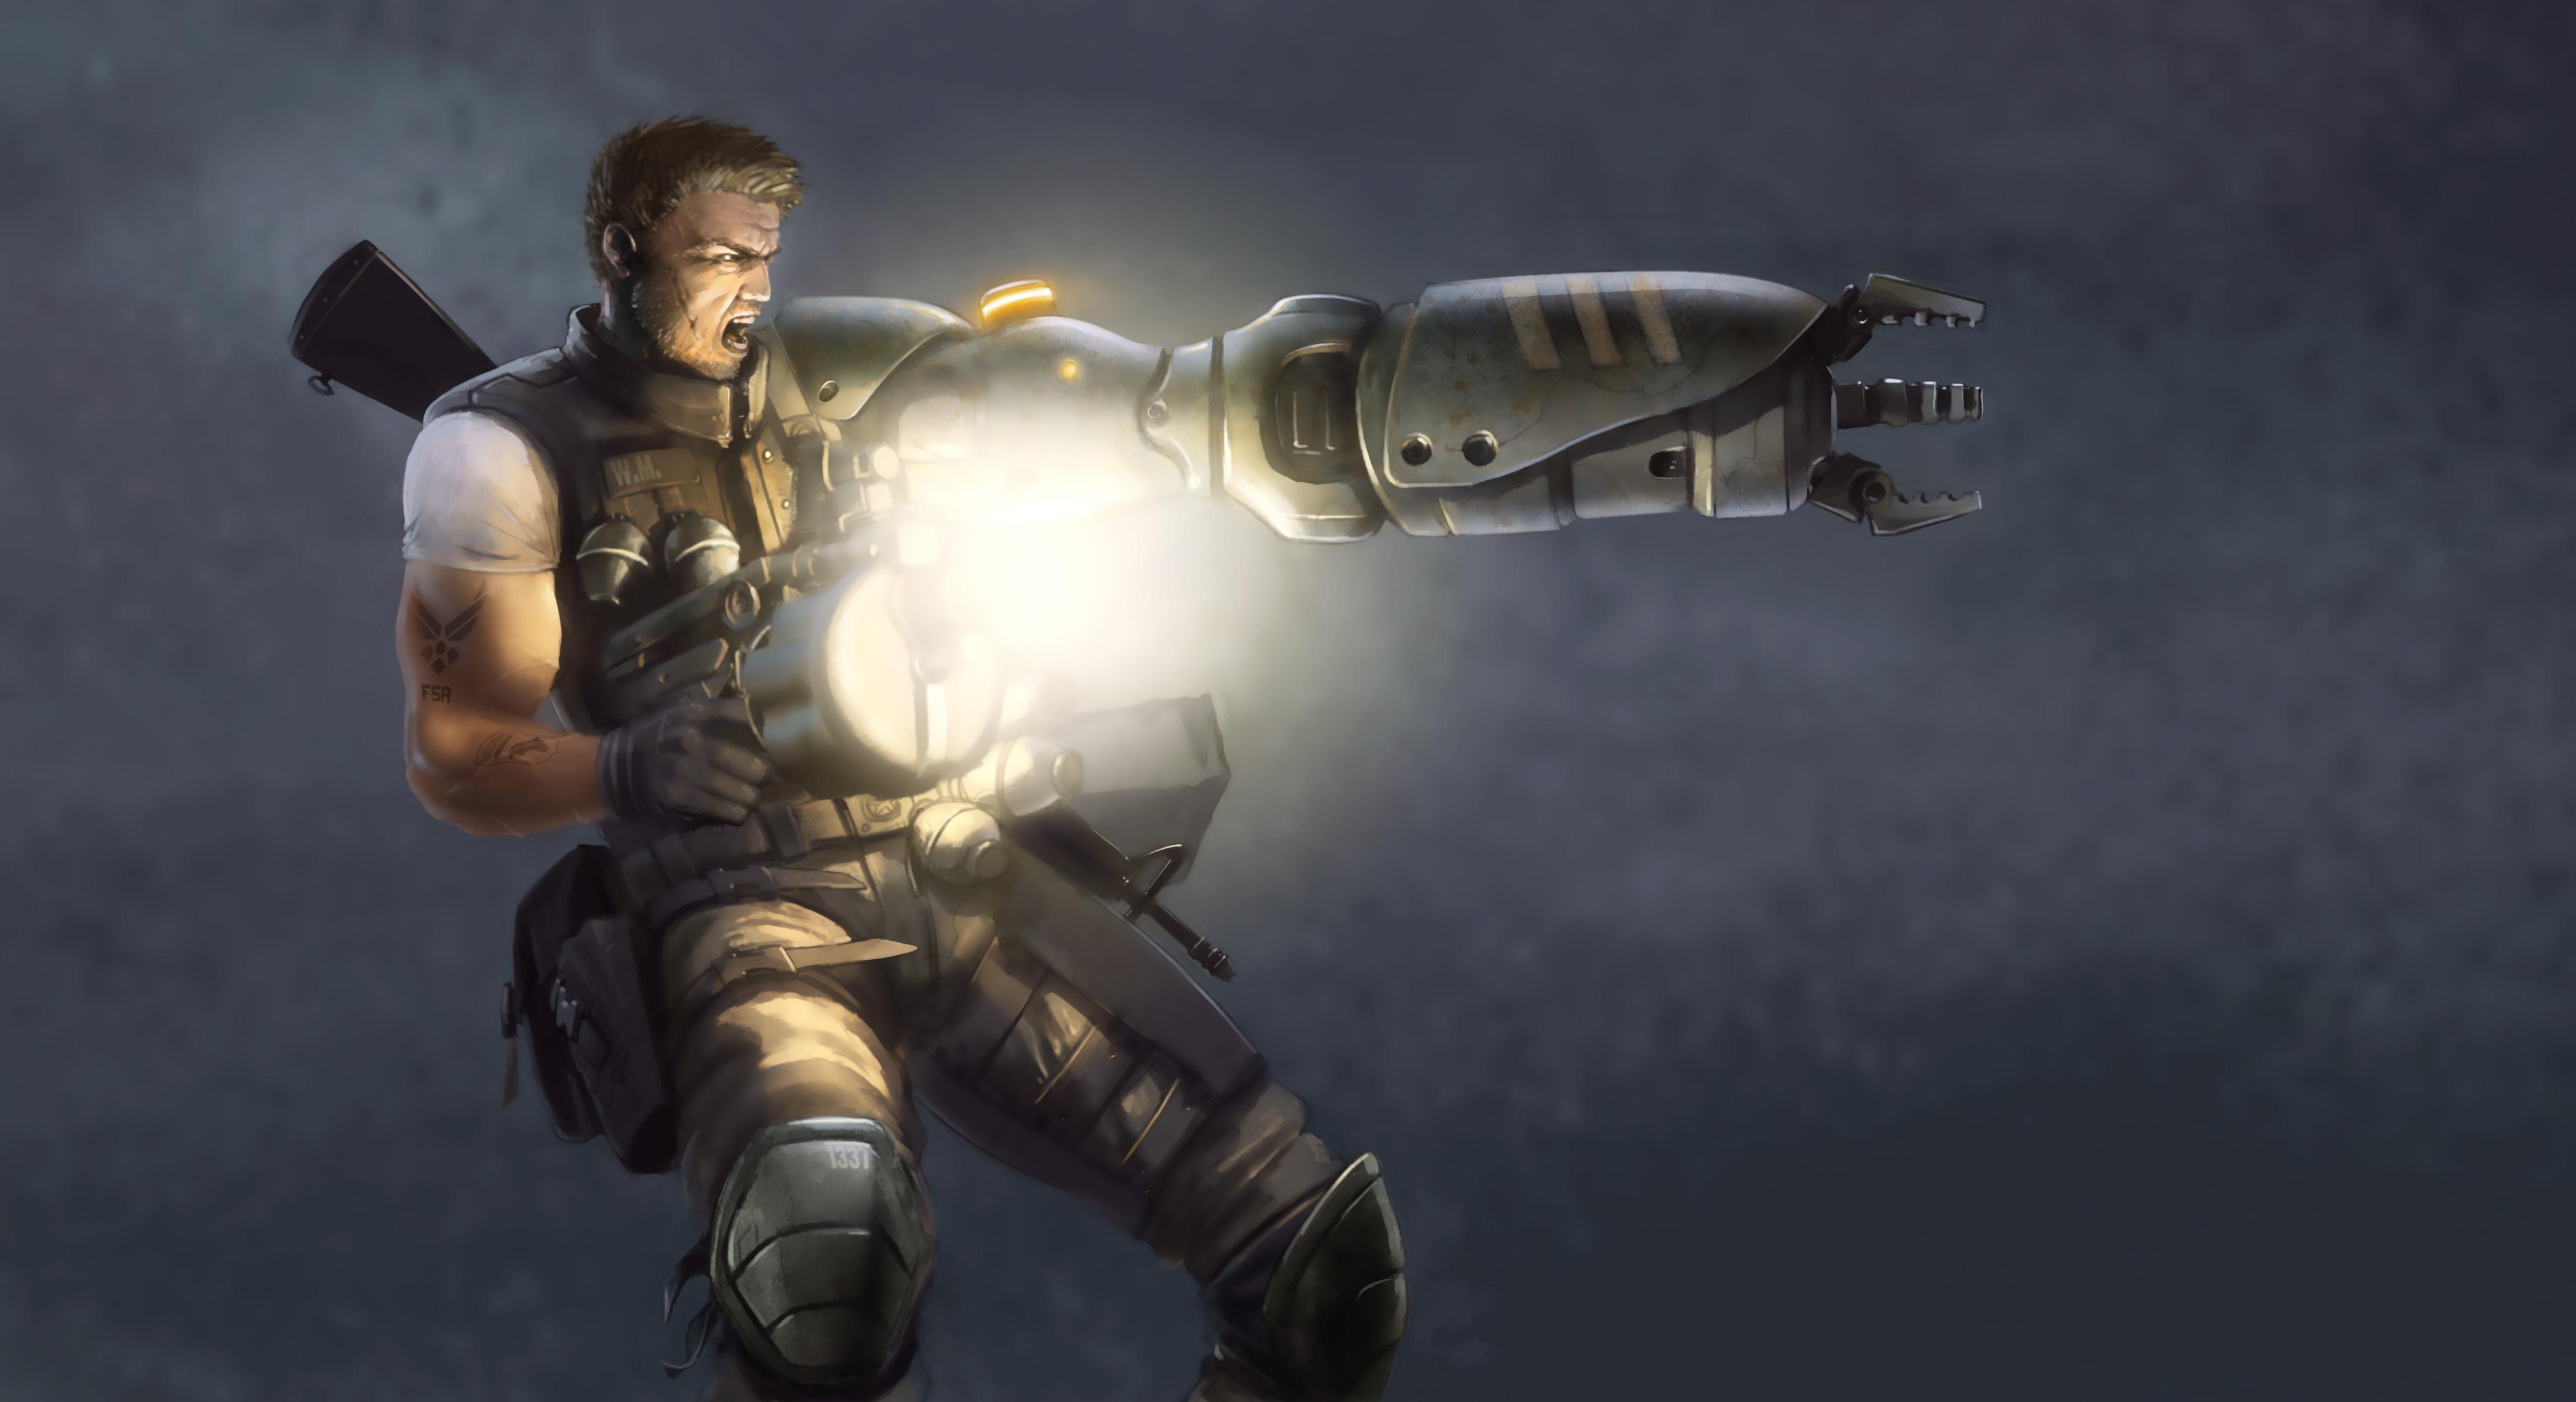 Bionic Commando Concept Art - Nathan Rad Spencer 06.jpg